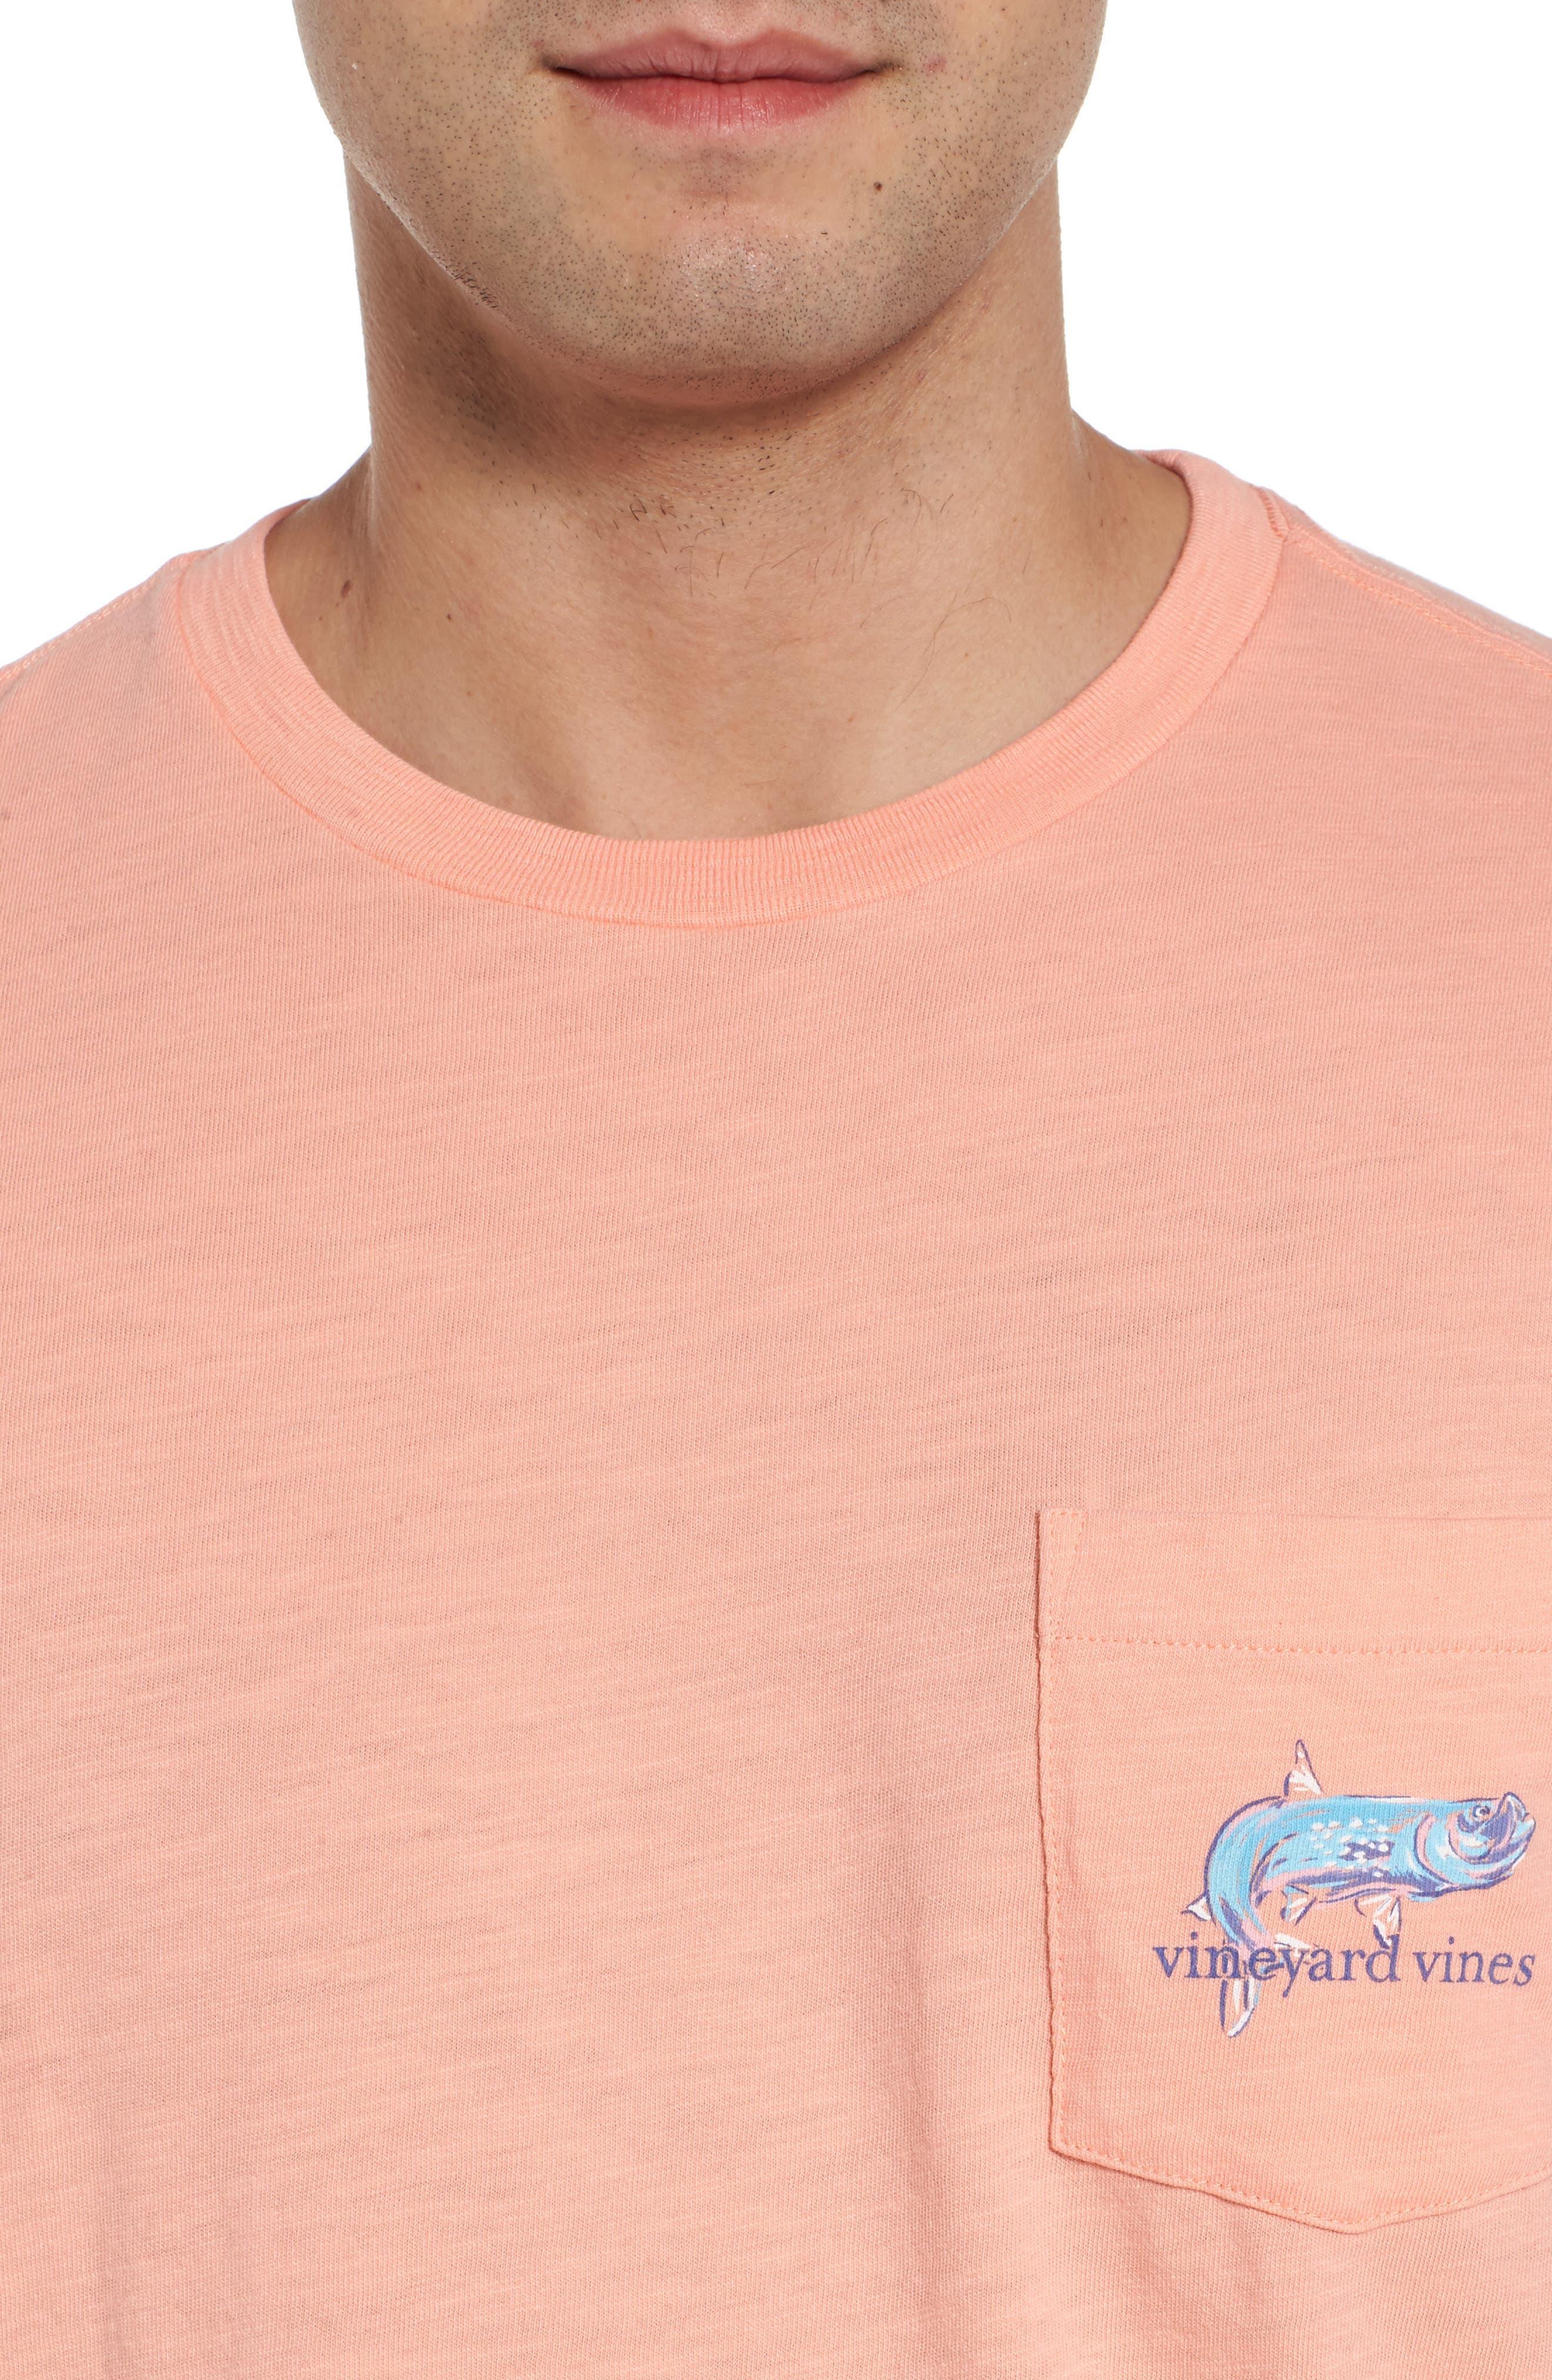 Painted Tarpon Graphic Pocket T-Shirt,                             Alternate thumbnail 4, color,                             821